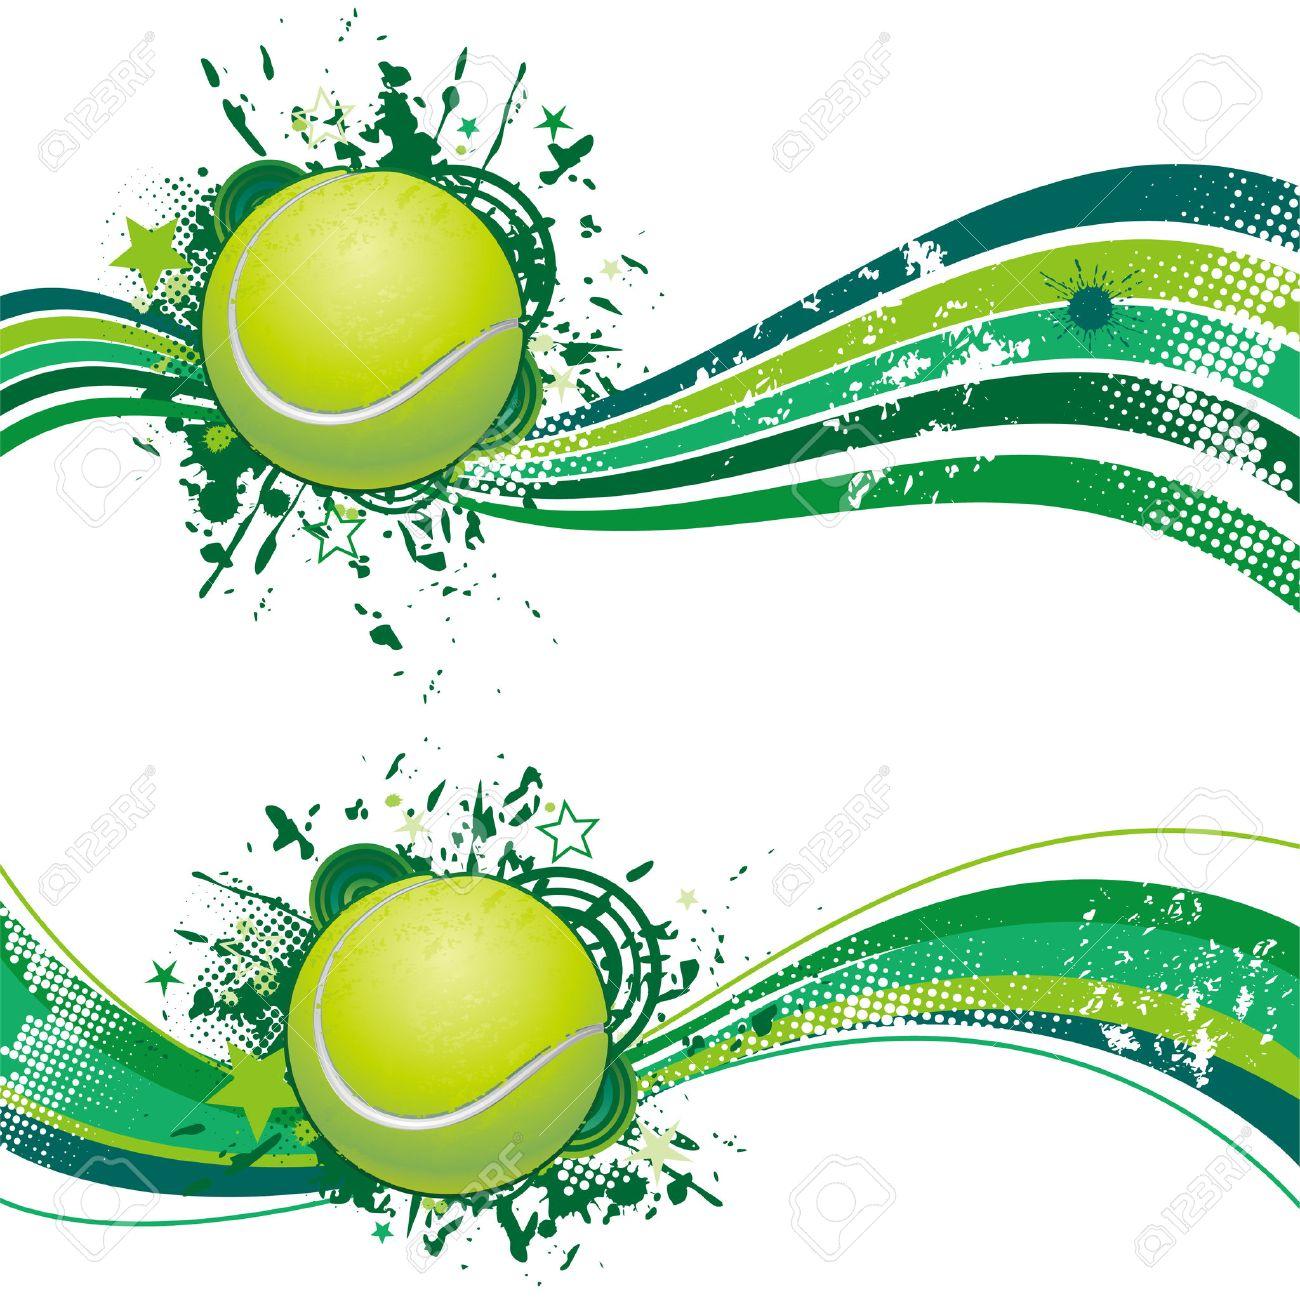 Tennis ball mascot stock photos tennis ball mascot stock photography - Tennis Ball Tennis Design Element